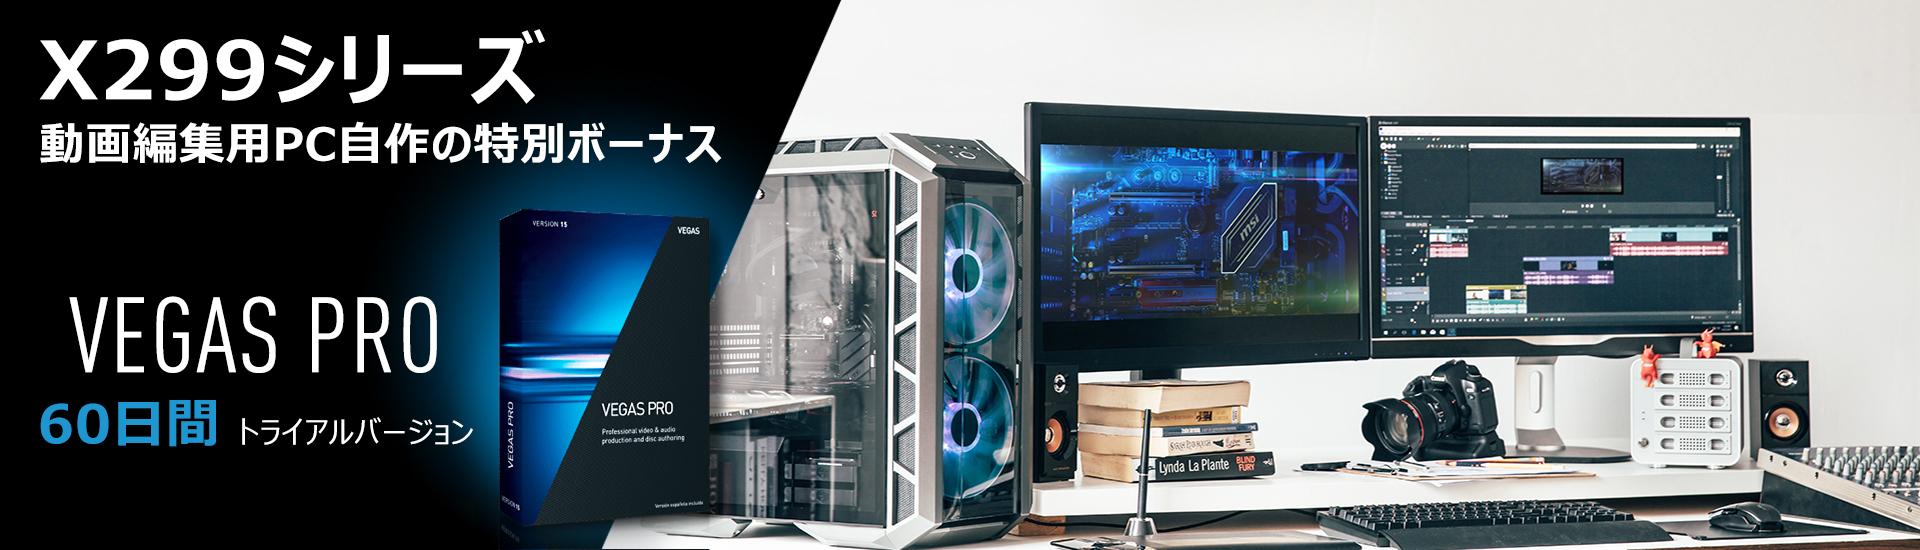 X299&Z370シリーズ動画編集用PC自作の特別ボーナス